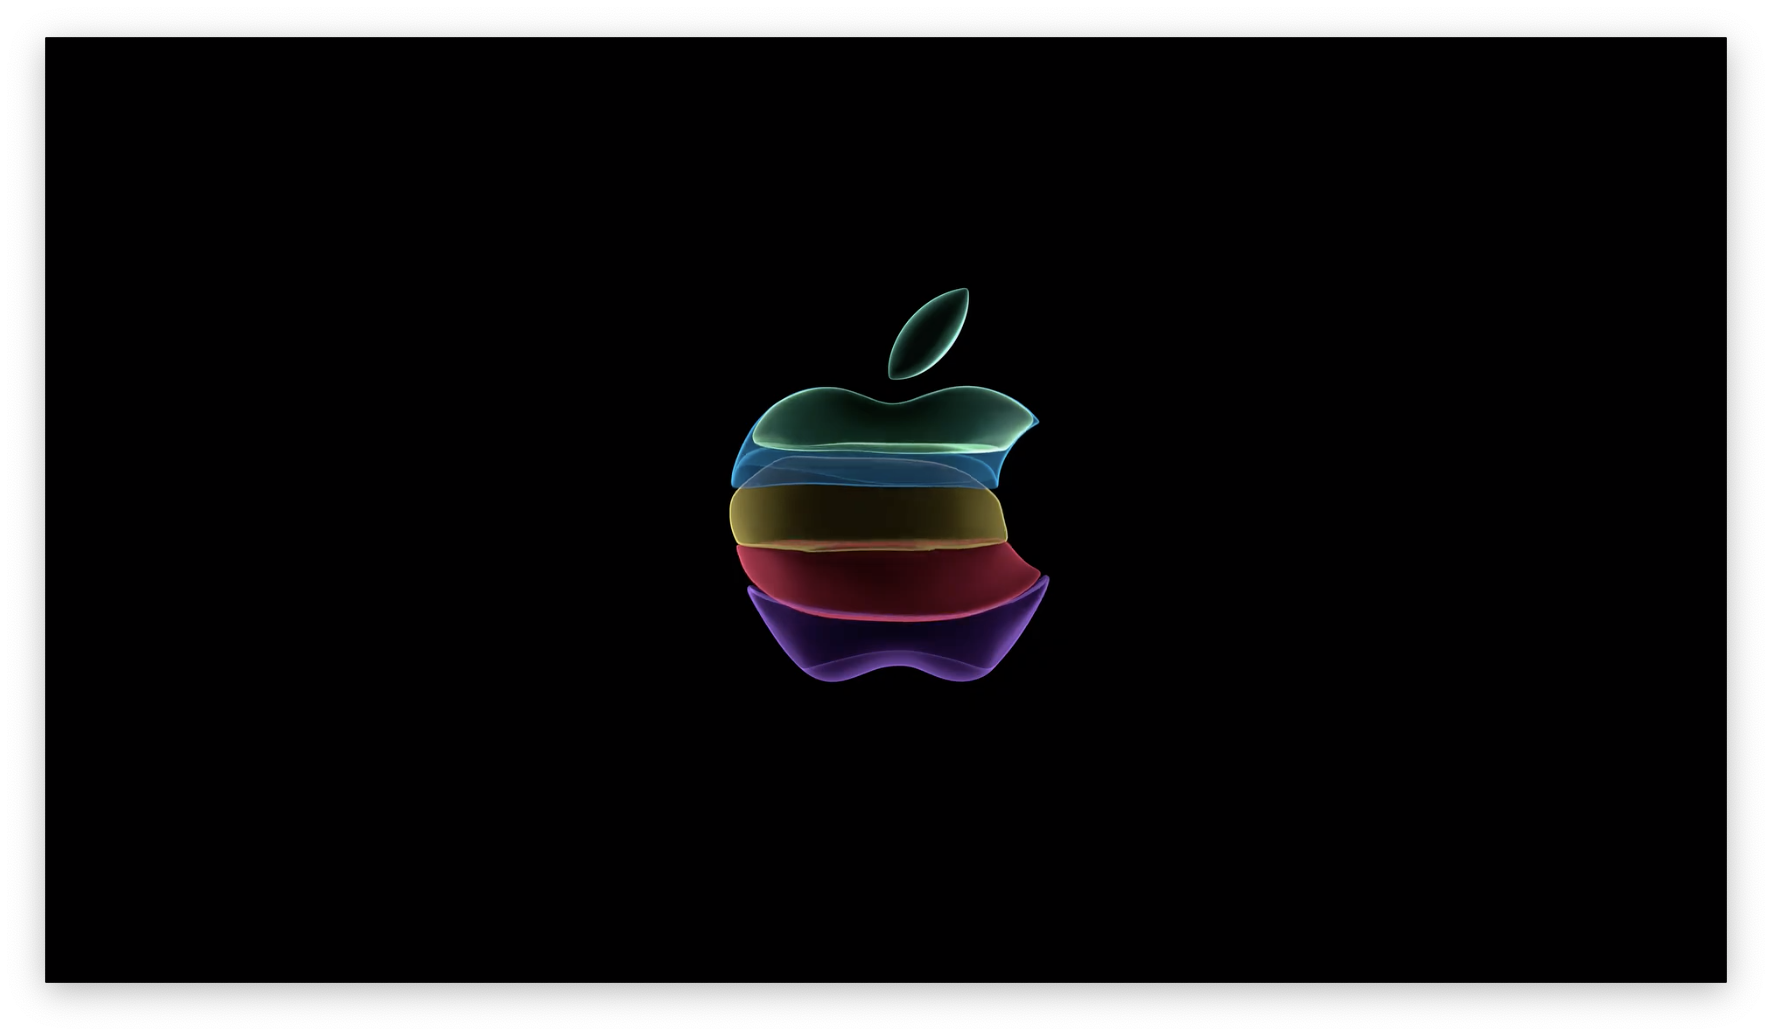 Apple Specialイベント【ライブ更新終了】